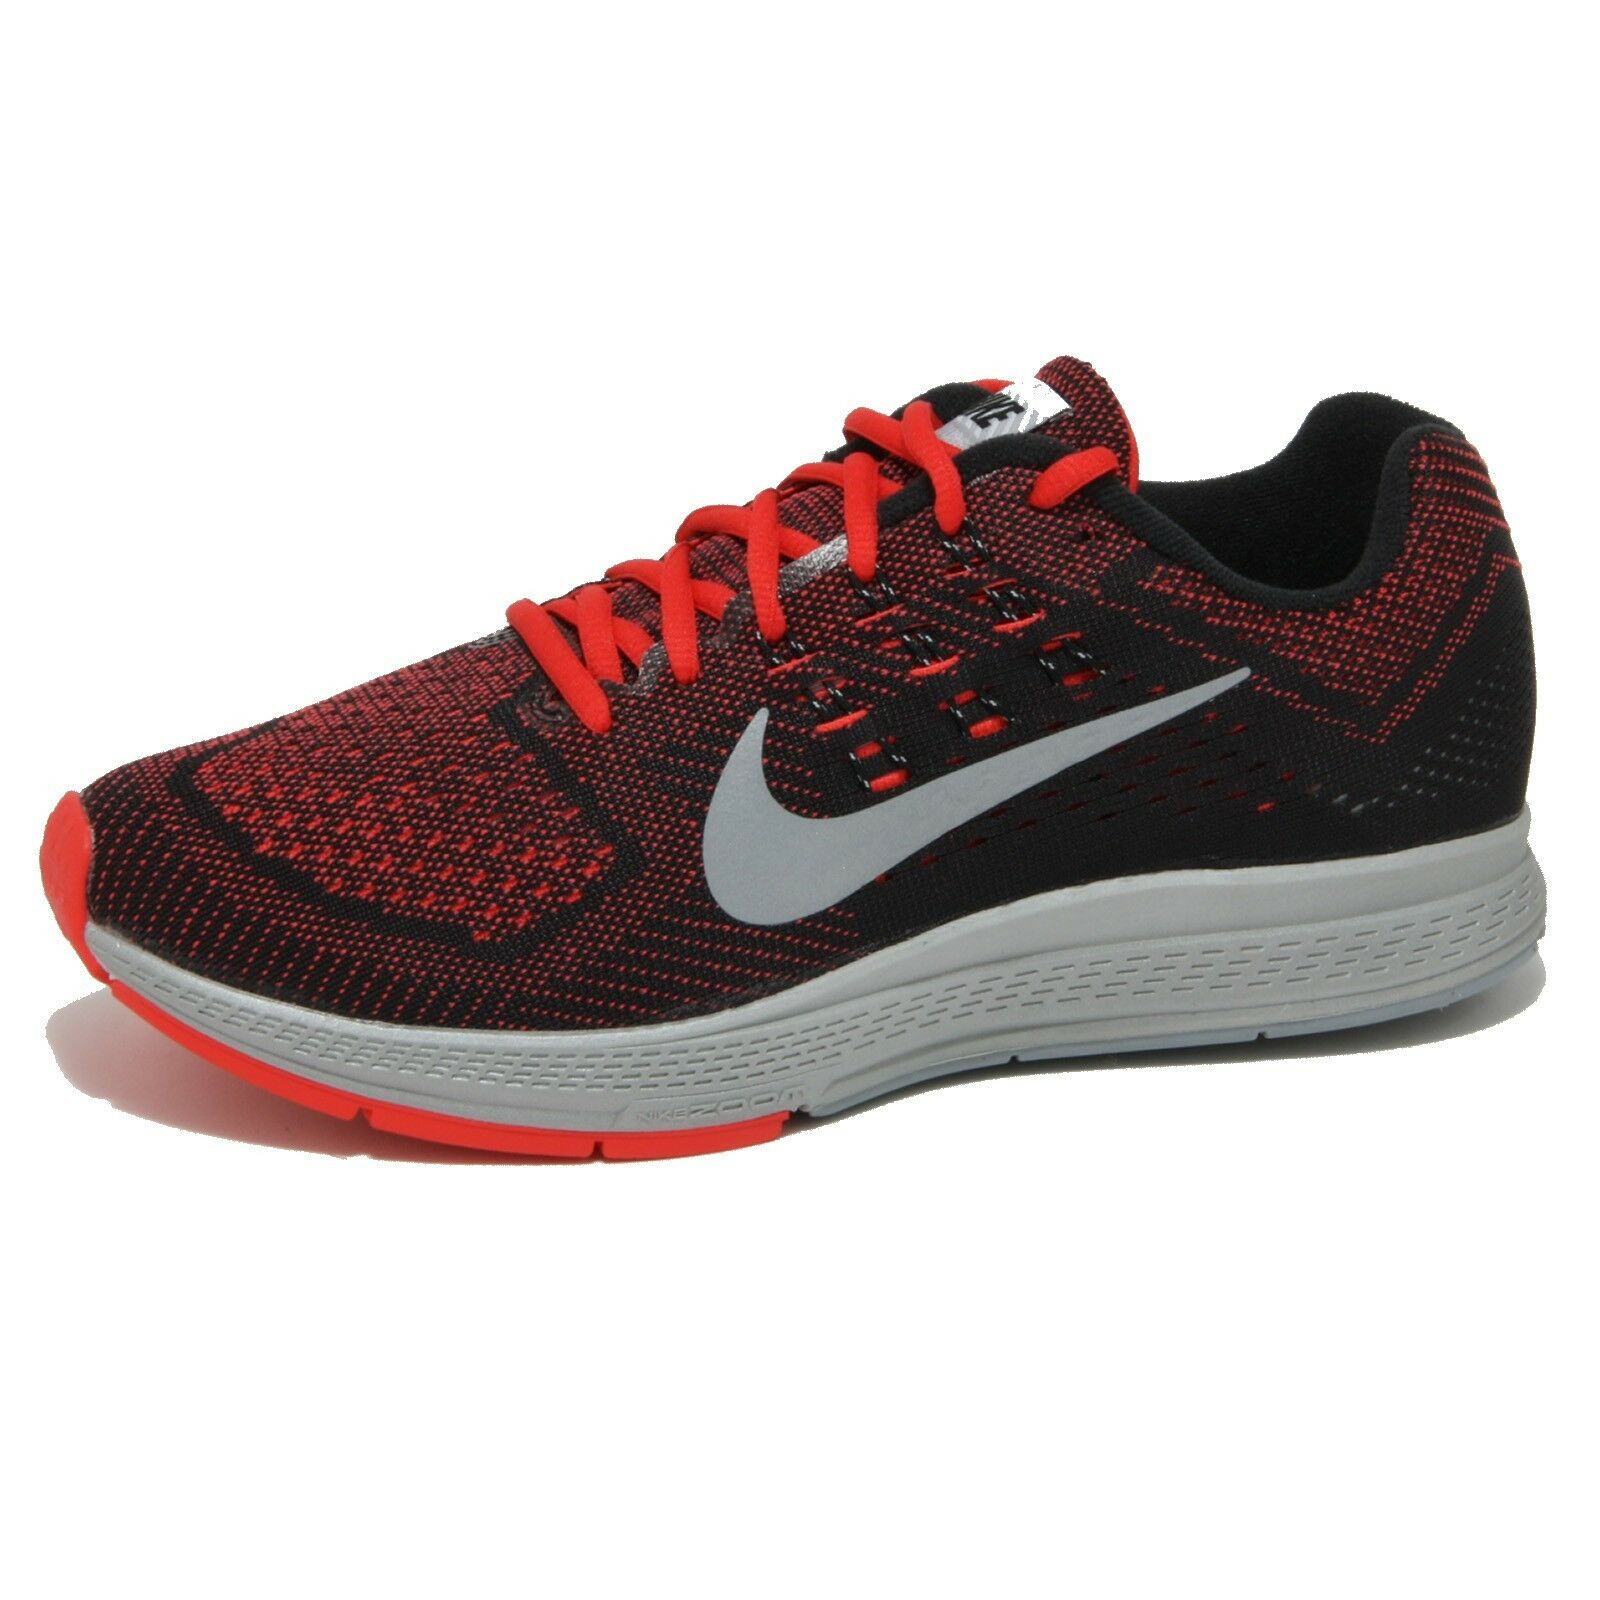 1482O sneaker scarpe NIKE ZOOM STRUCTURE 18 FALSH scarpe sneaker uomo shoes men aa1af3